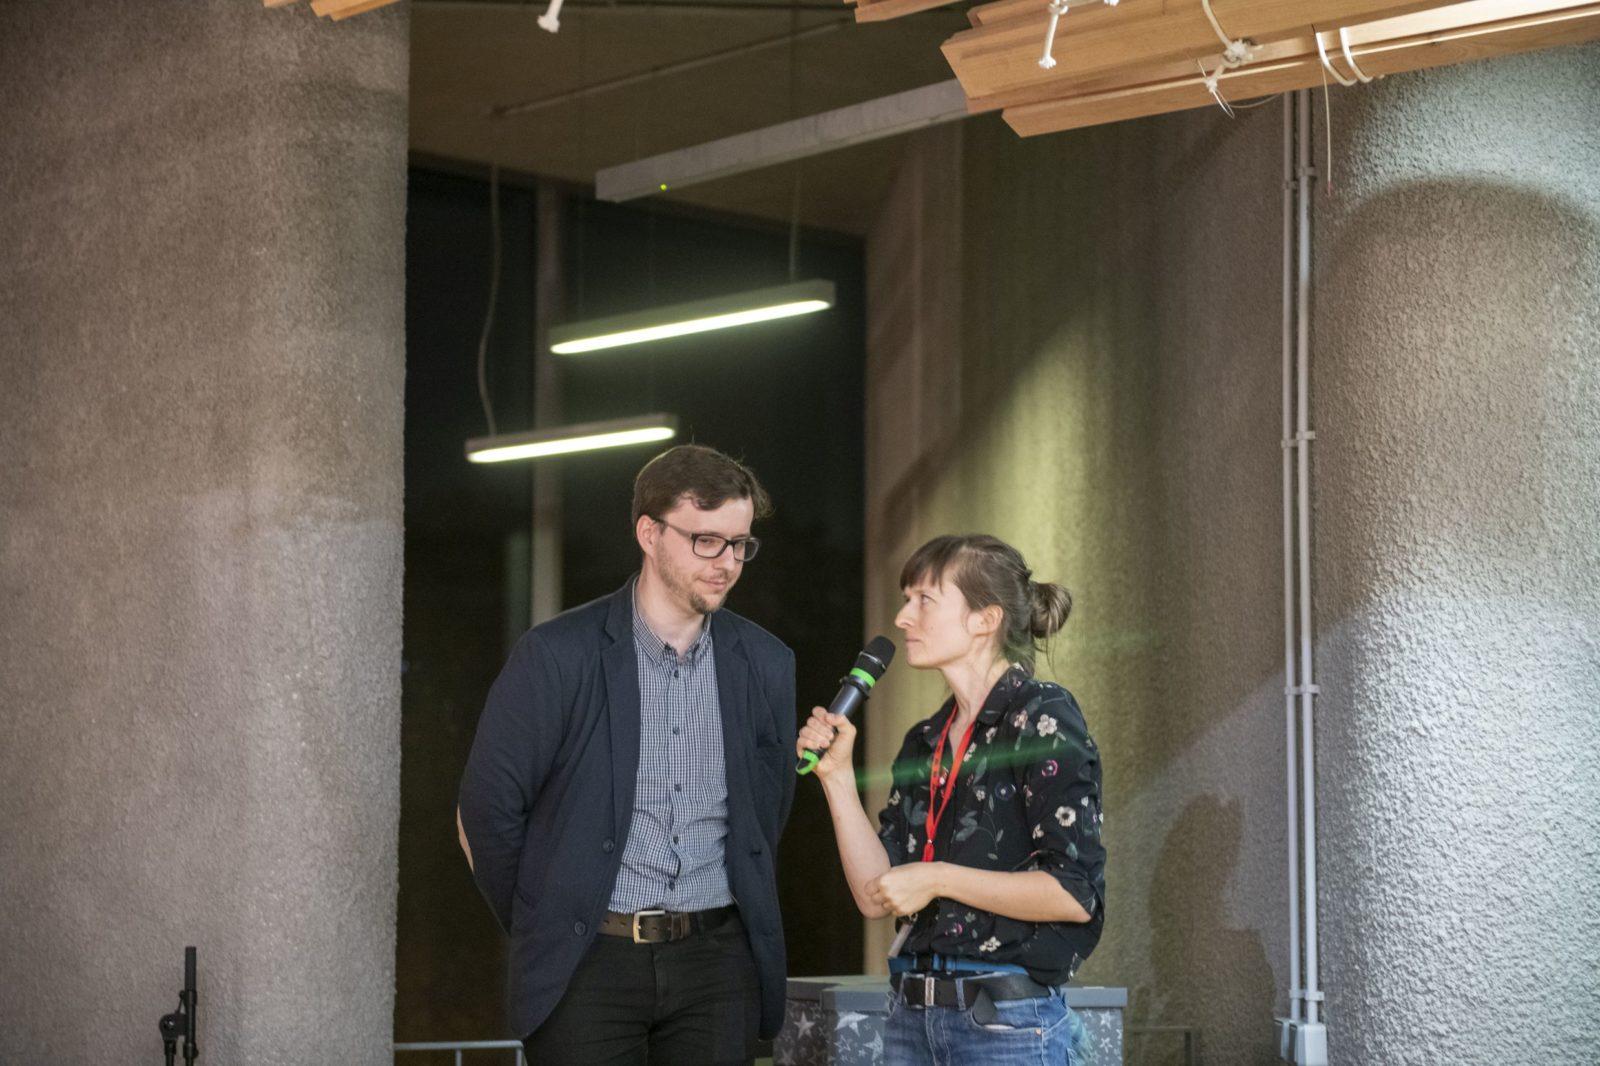 Warschau_2019_Empfang_reception_Thursday_Warsaw_Stasiuk_Konrad_278